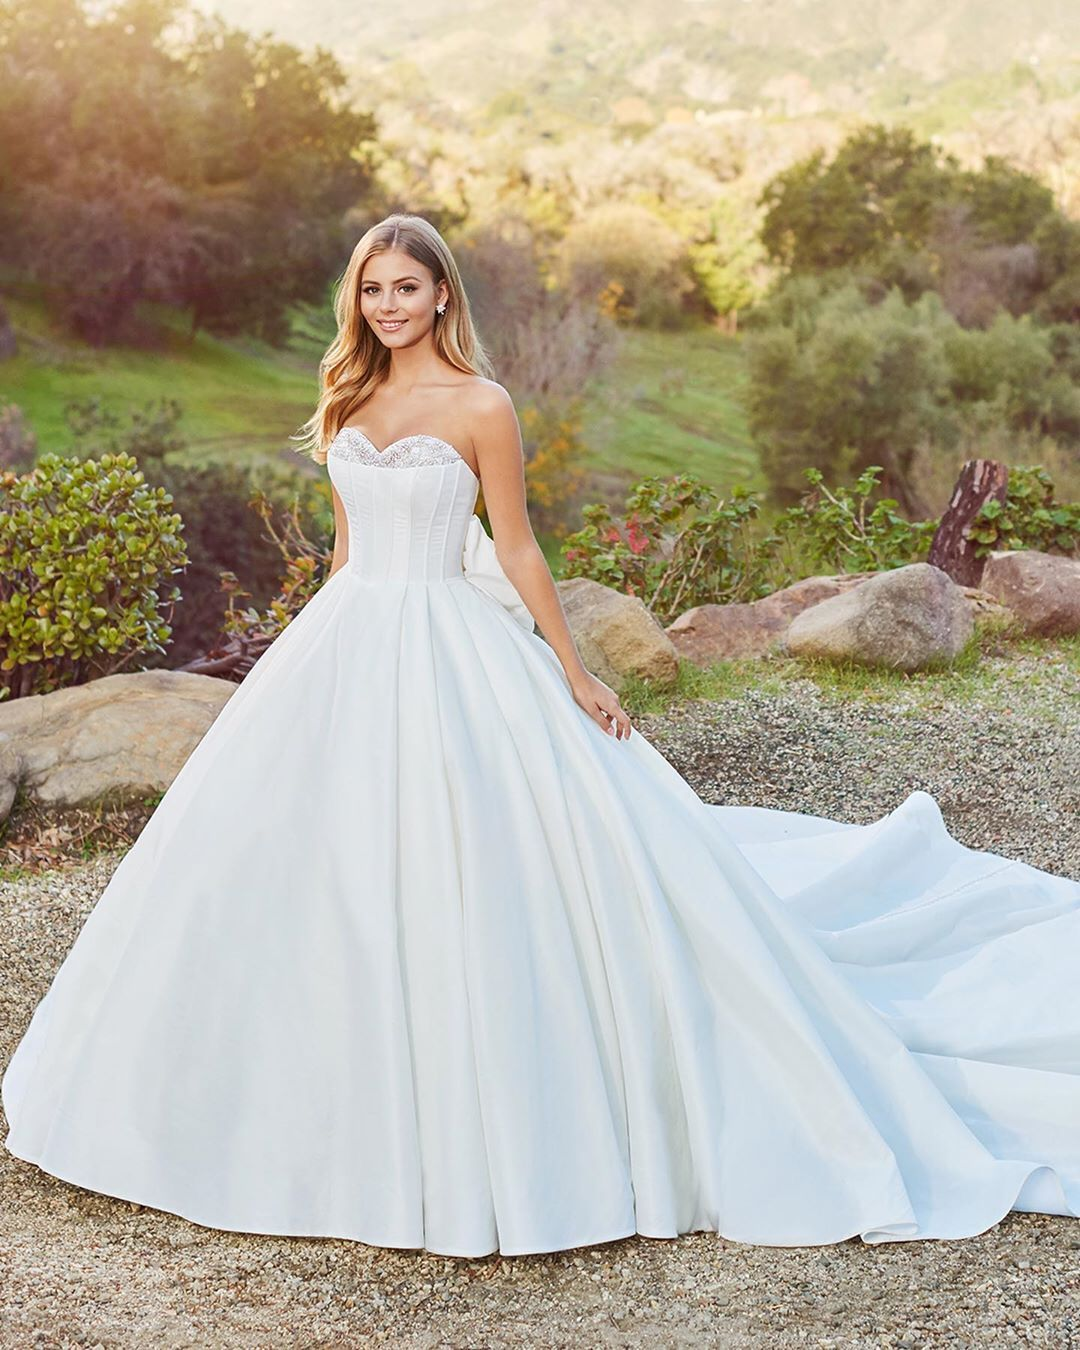 Pin By Ivory Promise On Wedding Ideas Wedding Dresses Simple Wedding Dresses Keyhole Back Wedding Dress [ 1350 x 1080 Pixel ]